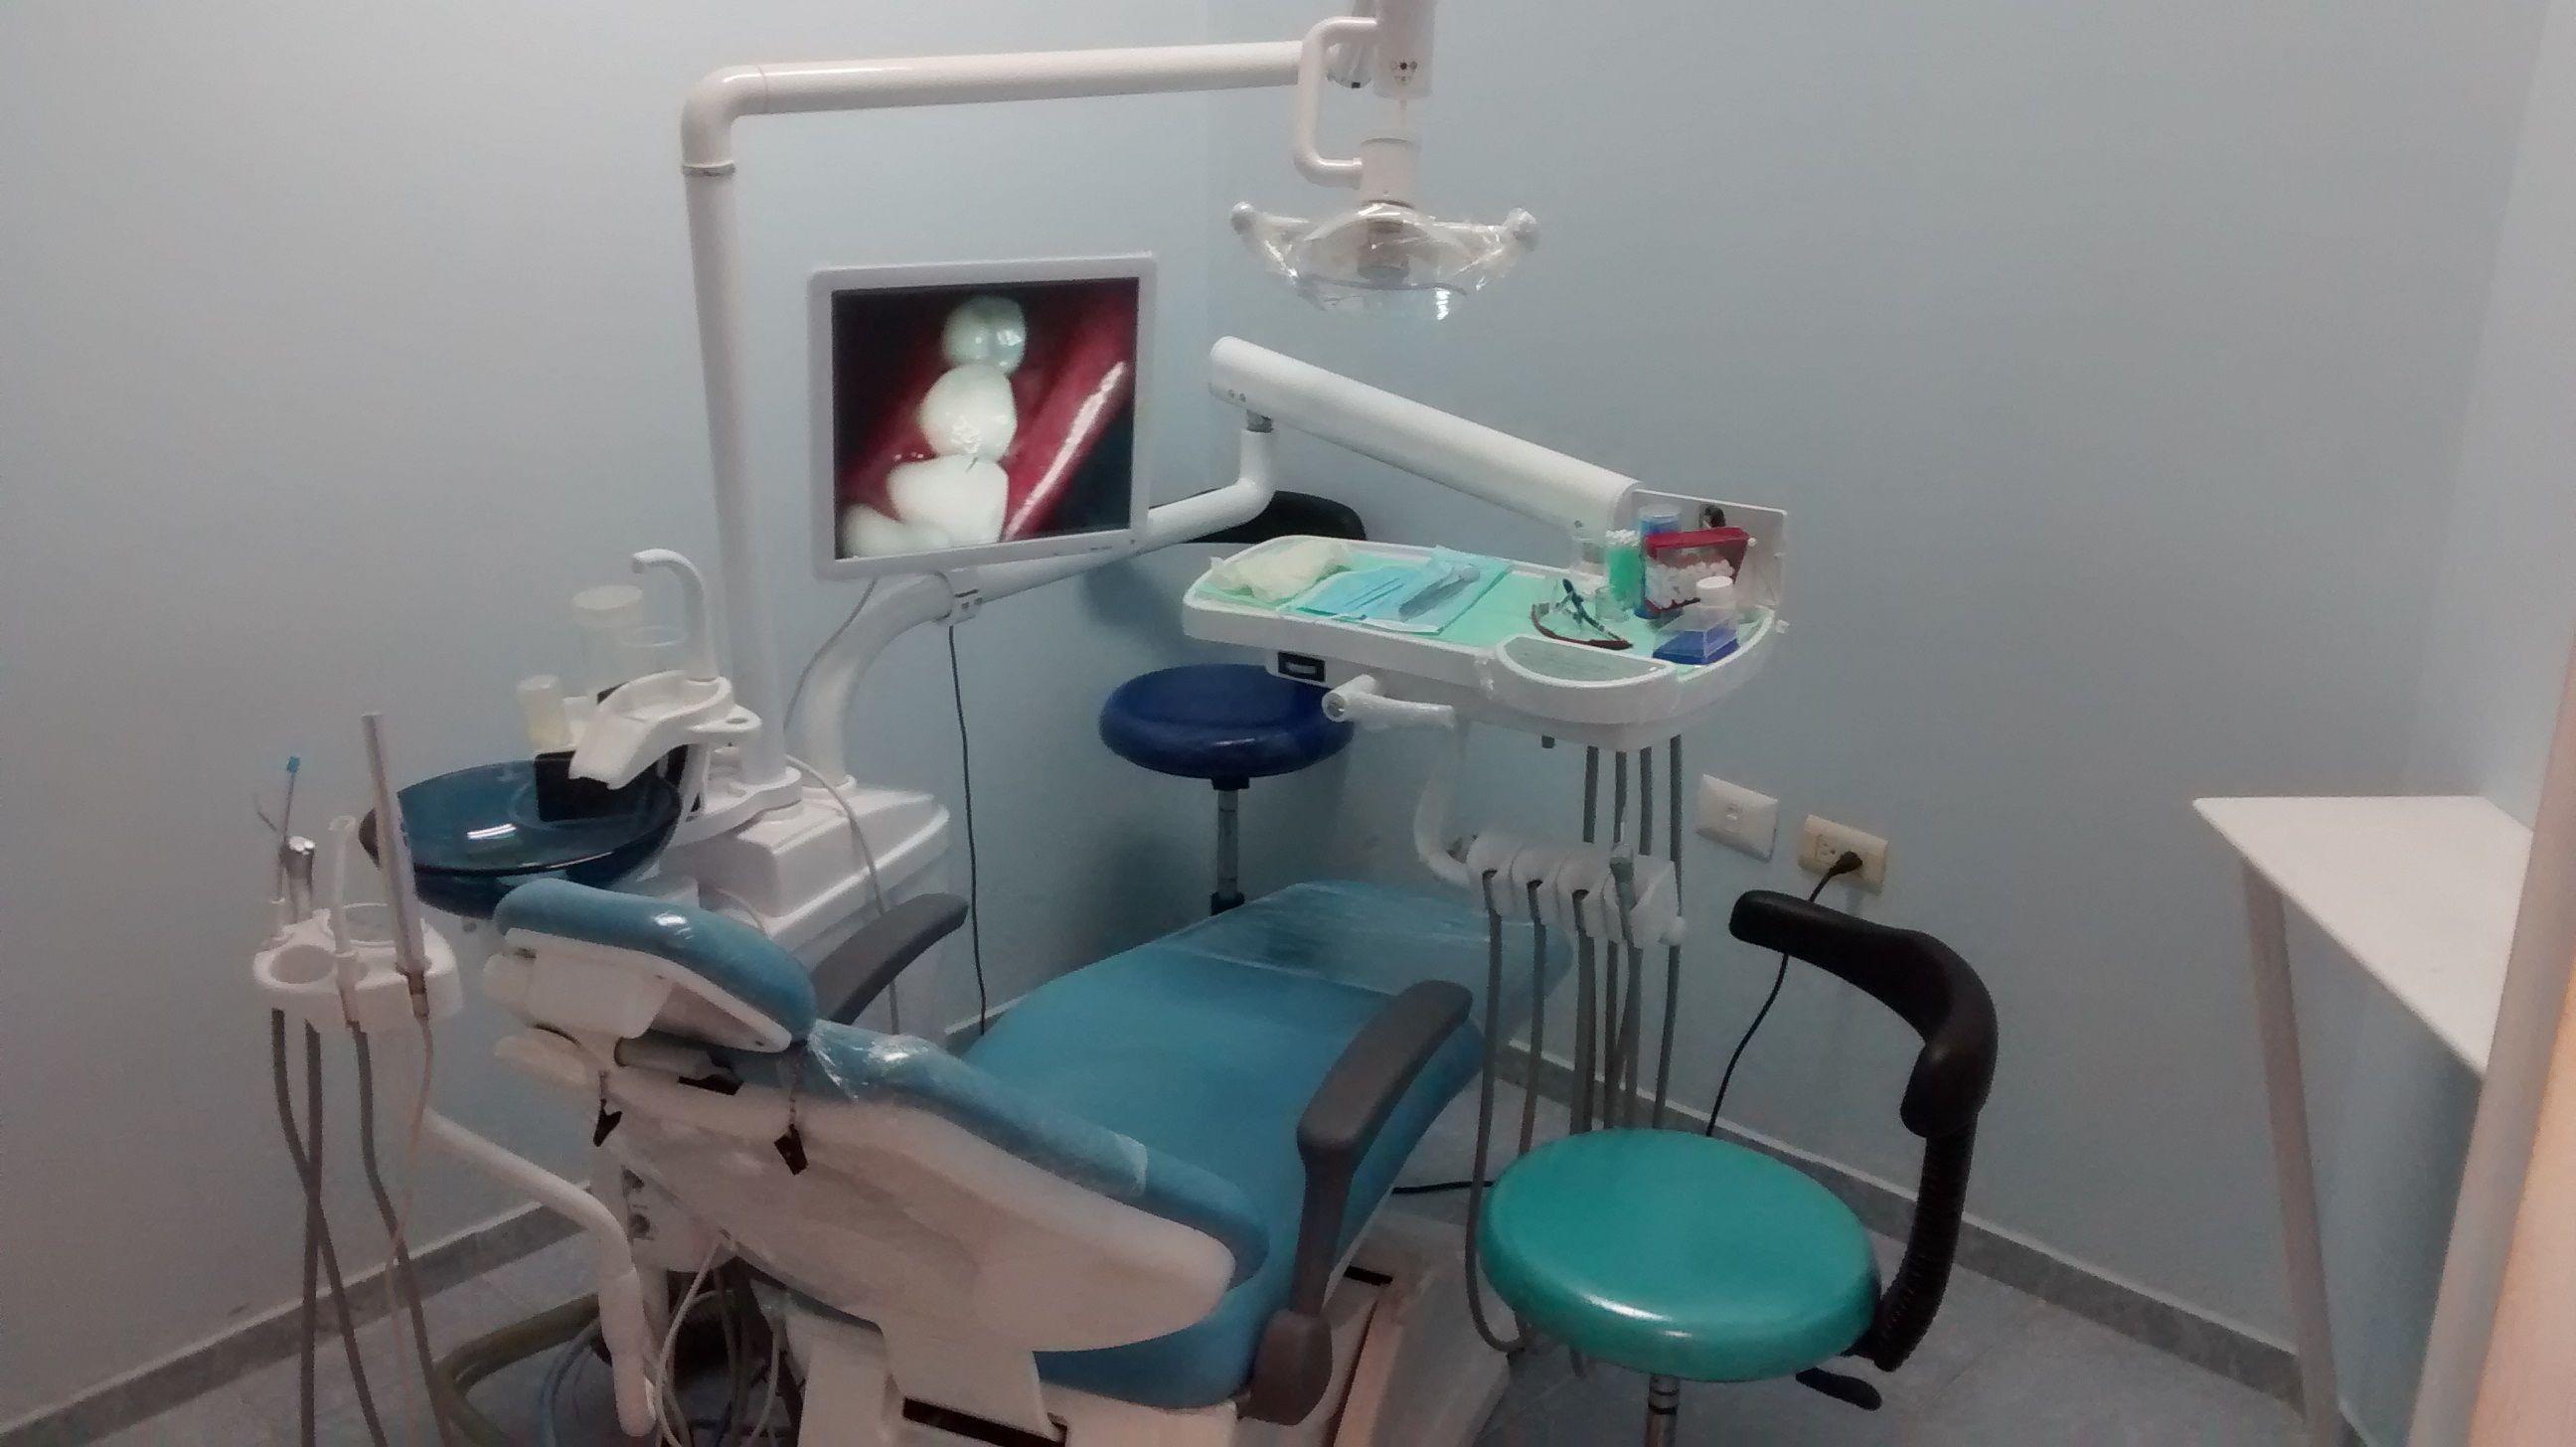 The McMillan Dental Clinic